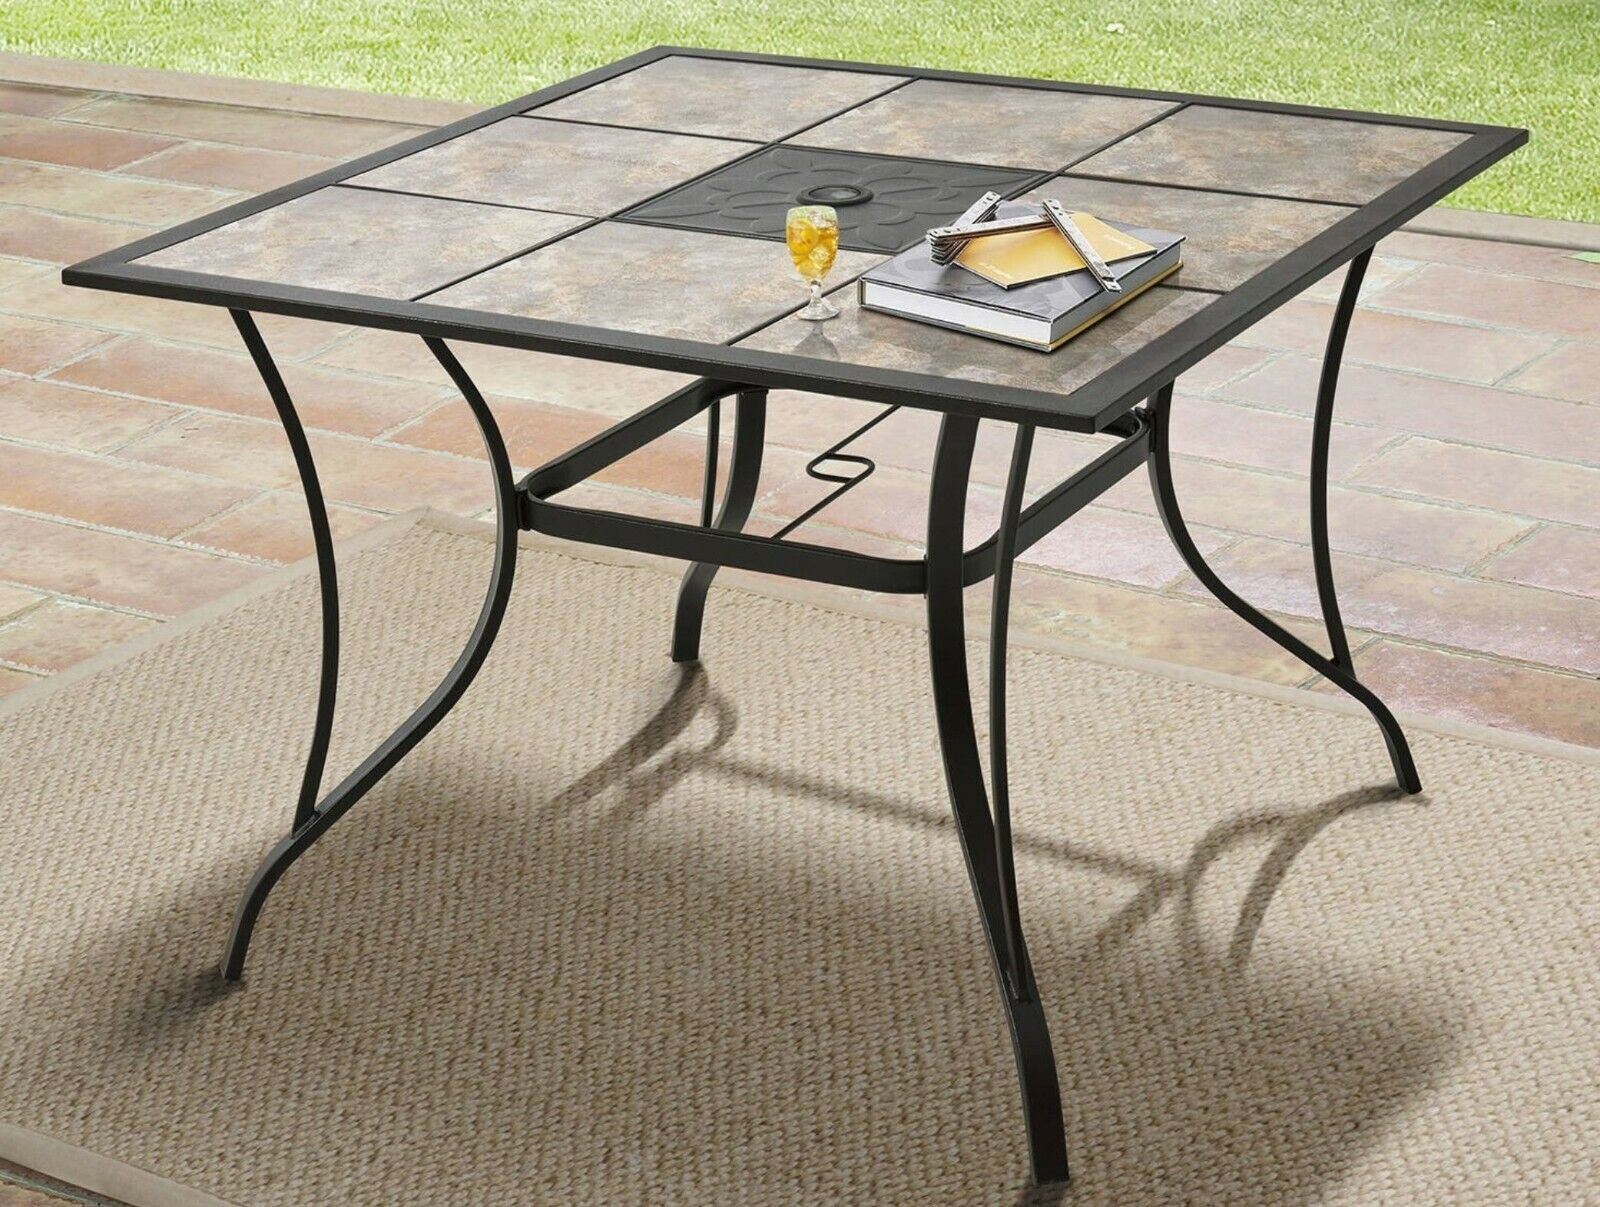 Steel Bistro Table Outdoor Patio Dining